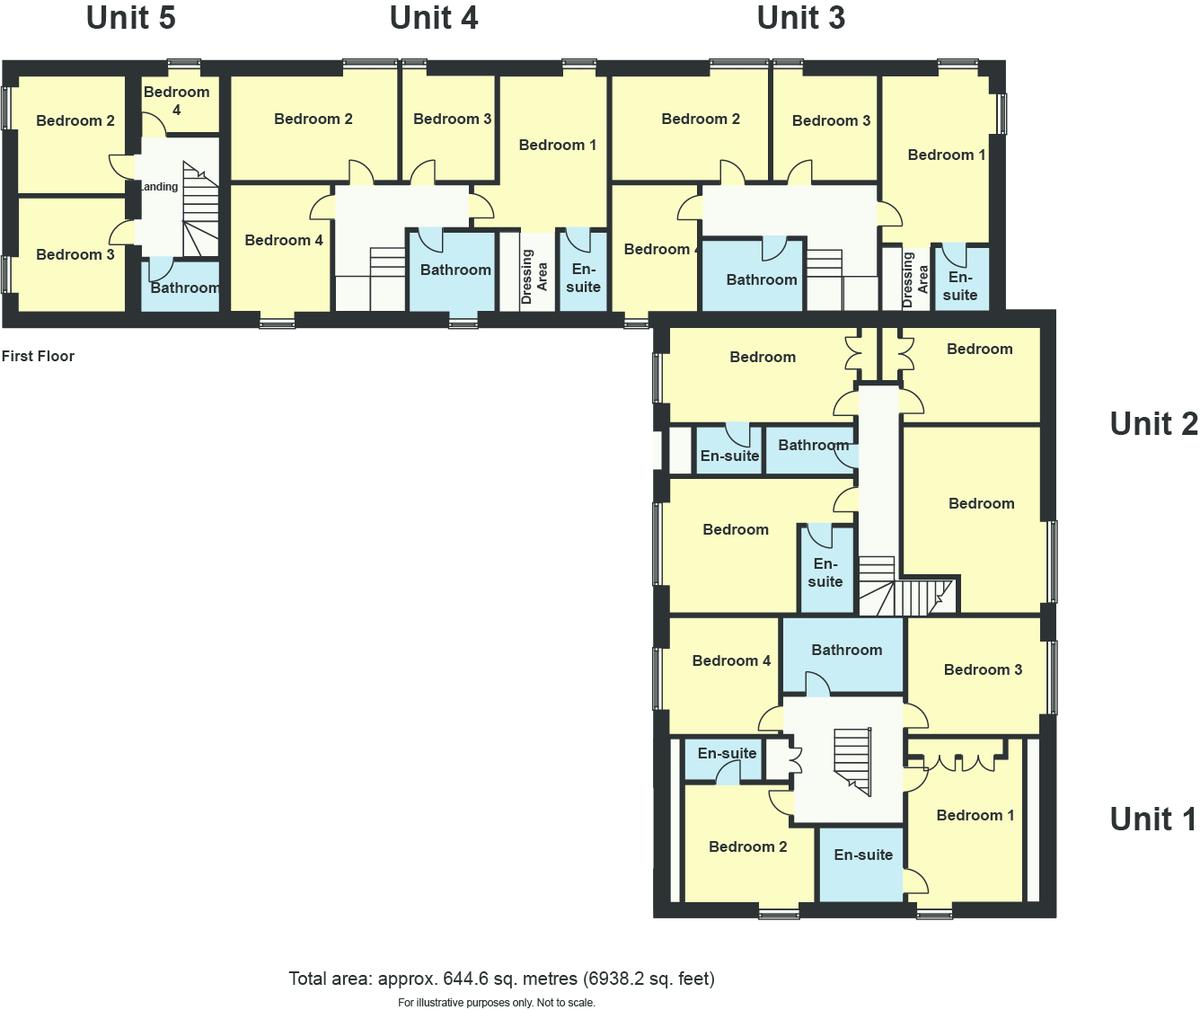 Floorplan Brigg House Barns, Helsington, Kendal, Cumbria, LA8 8AG